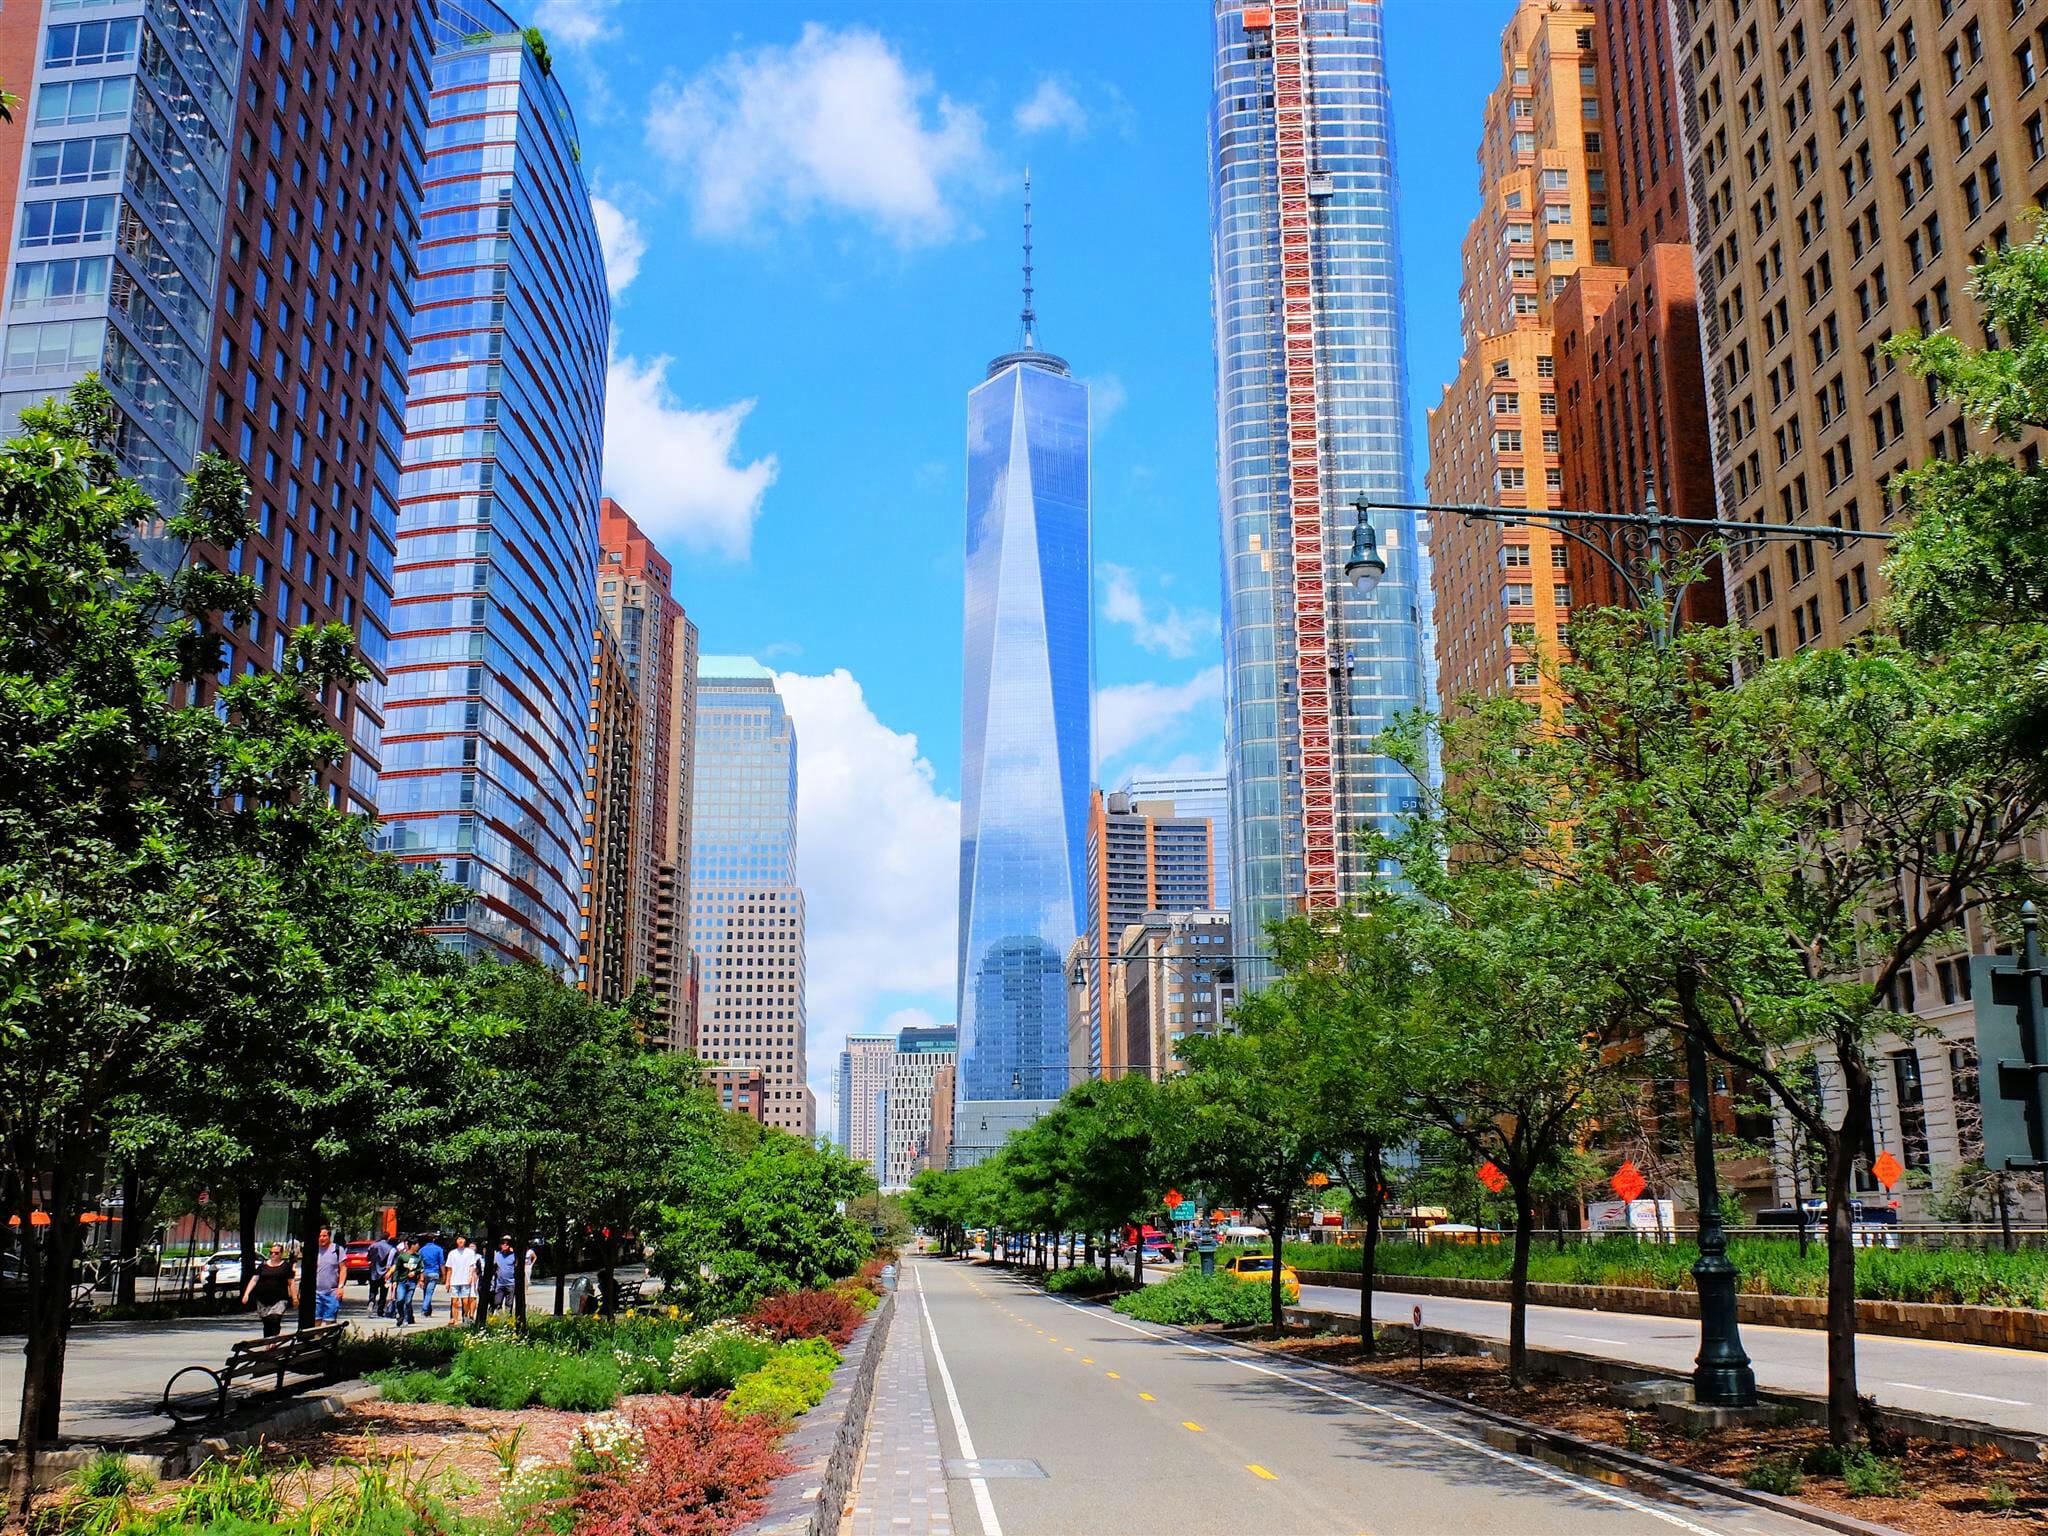 WTC High Quality Wallpaper